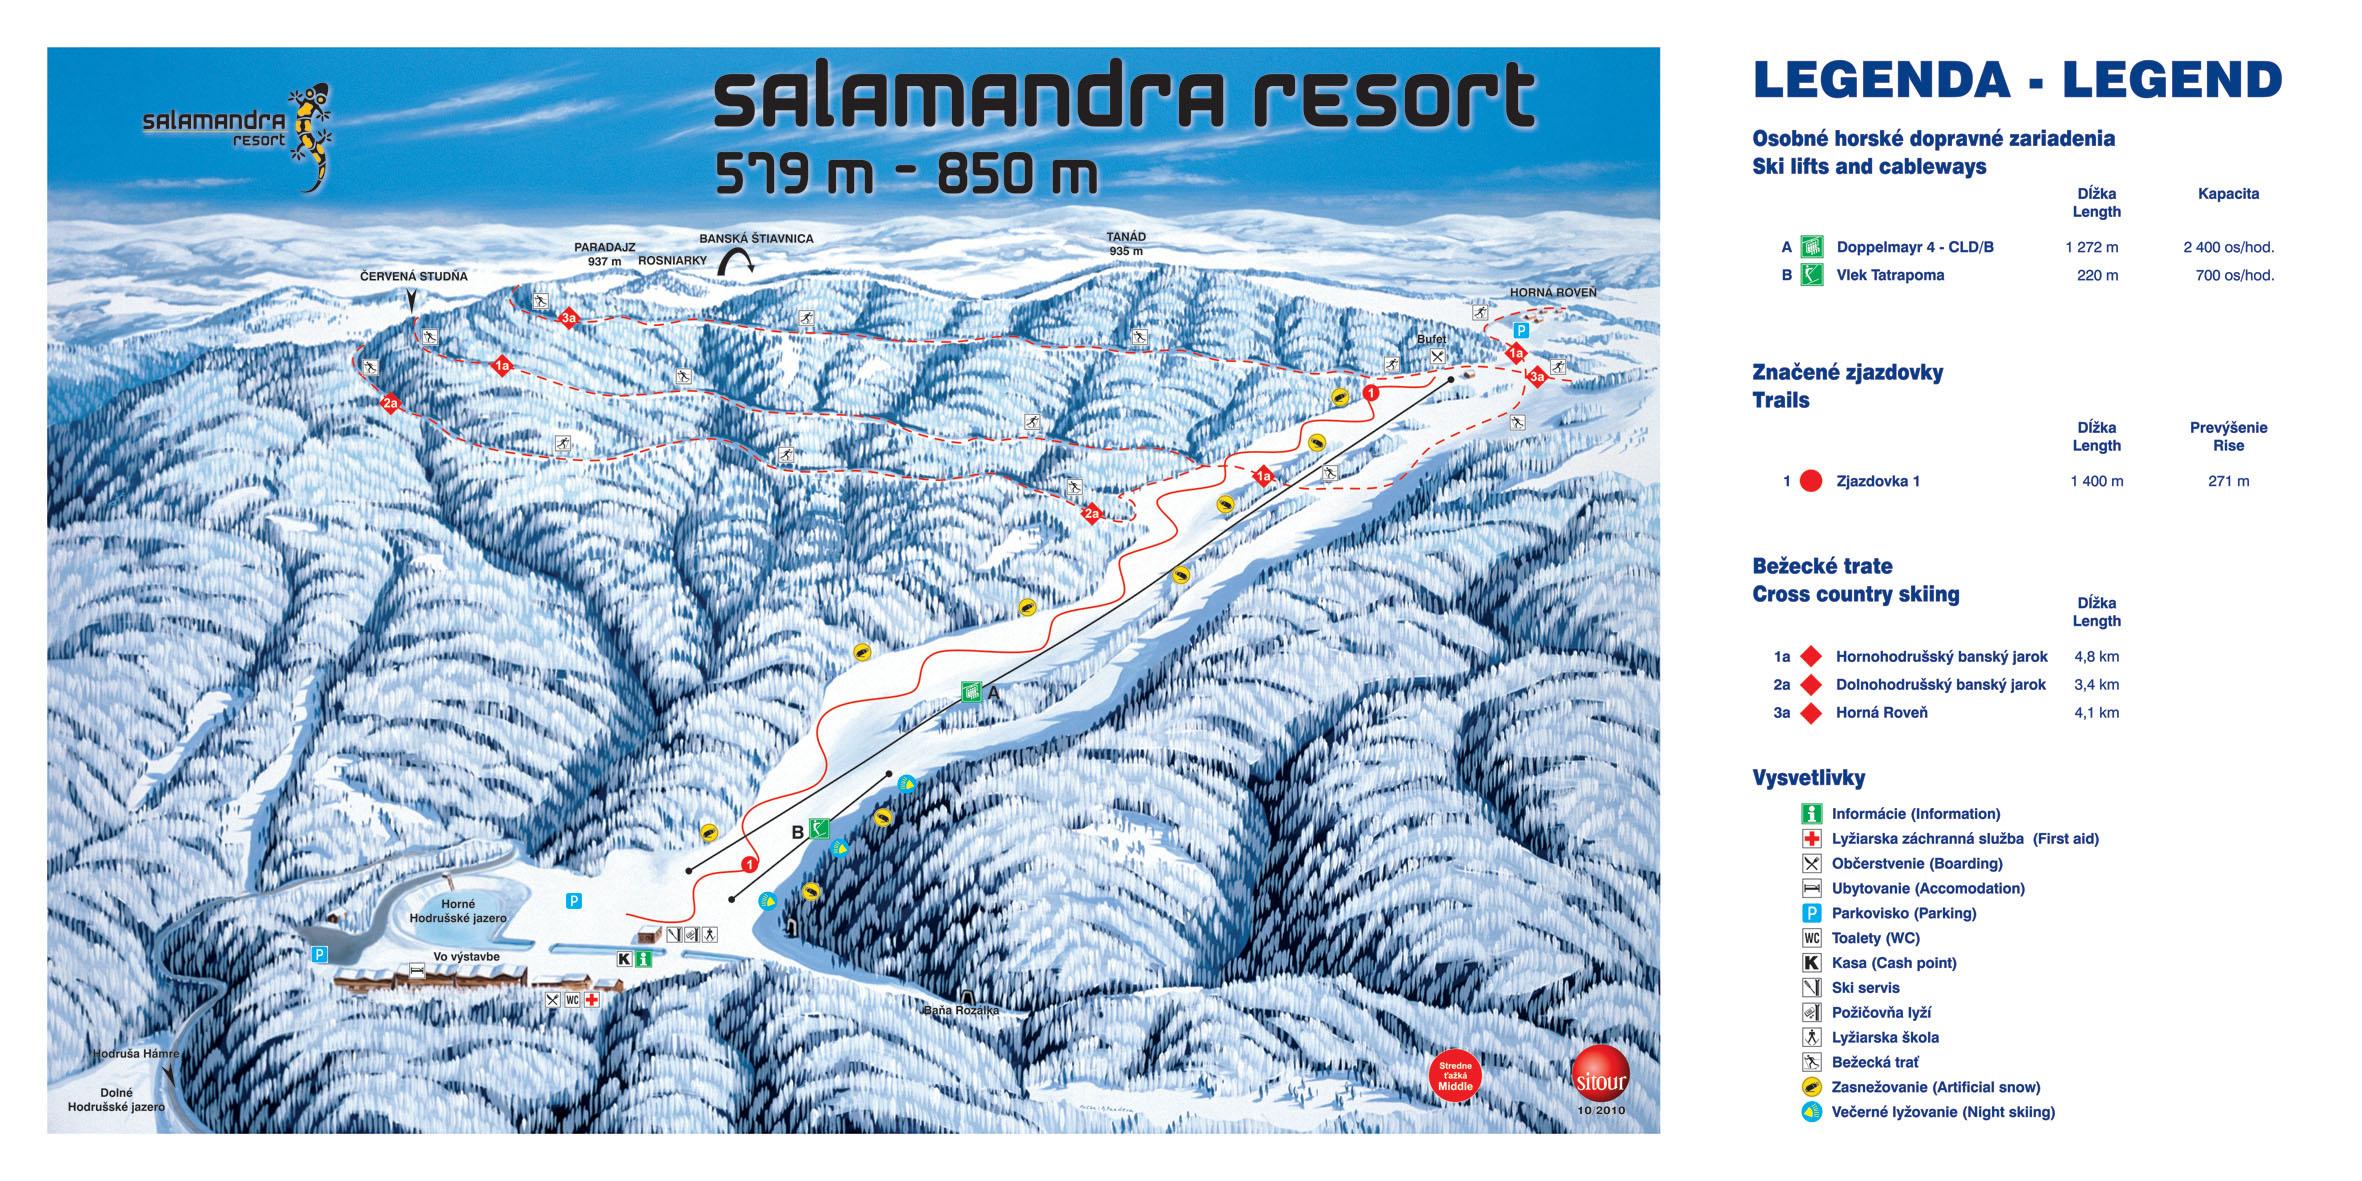 Mapa svahov v stredisku Salamandra resort